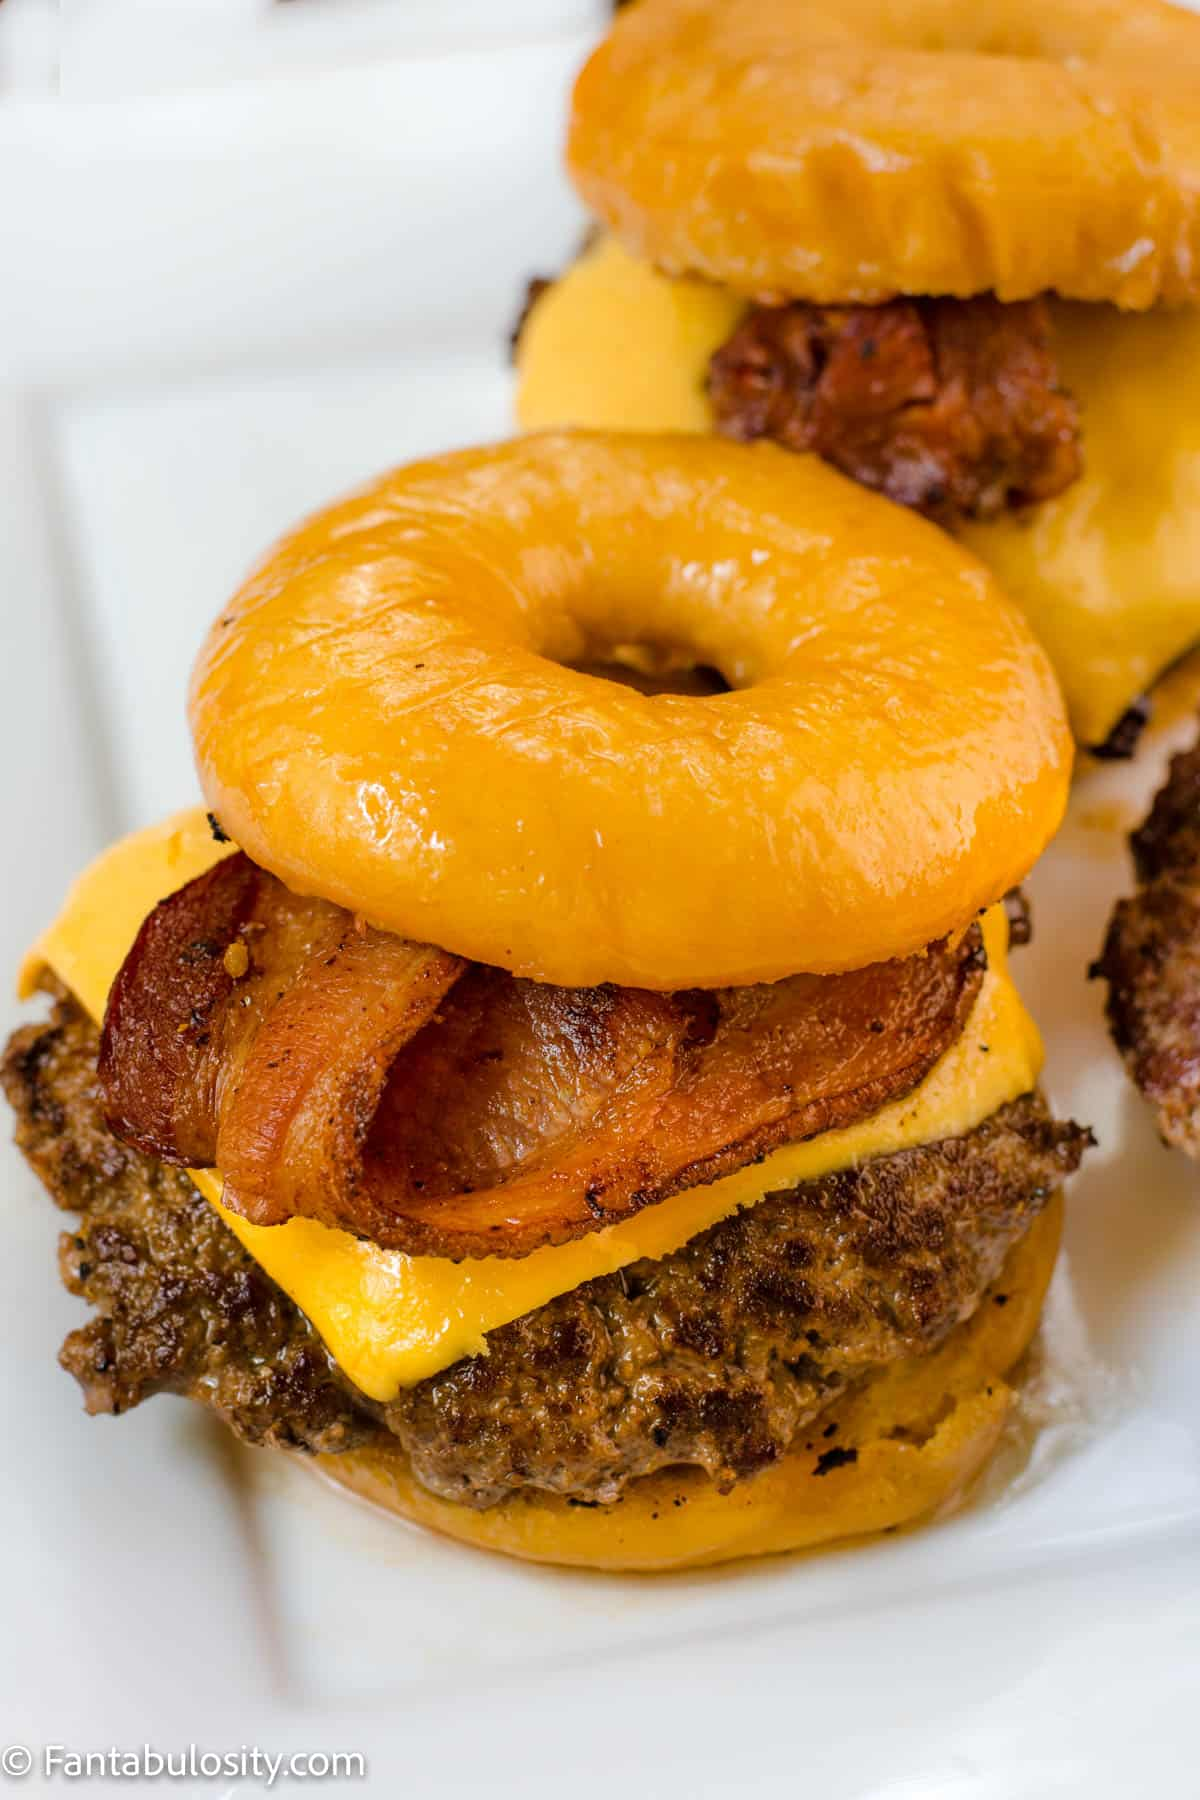 Donut burger - hamburger patty on krispy kreme glazed donuts